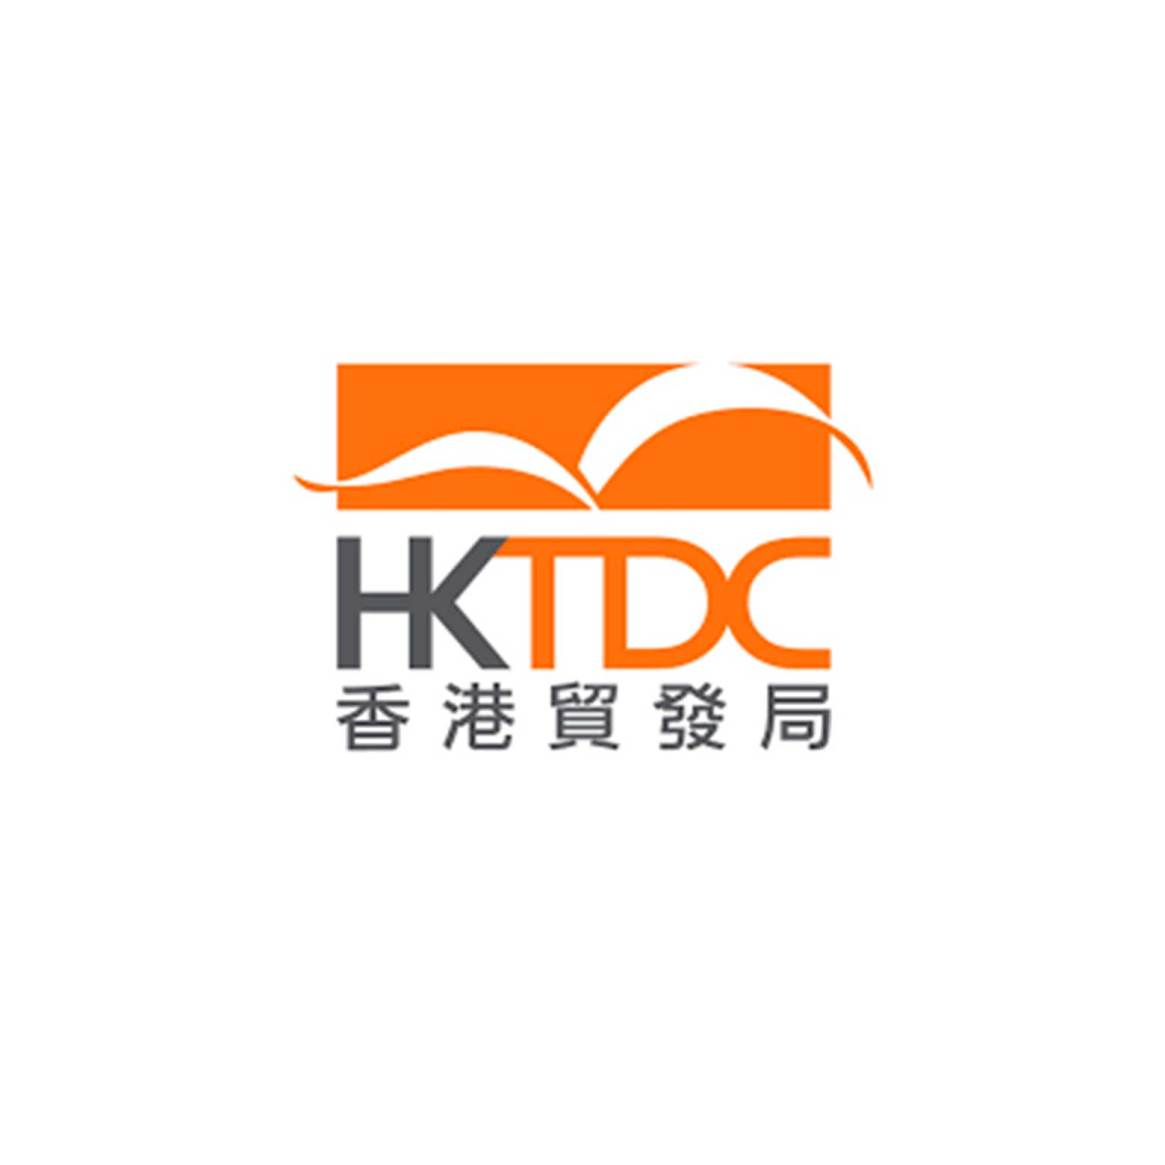 Hong Kong Trade  and Development Council  (HKTDC)